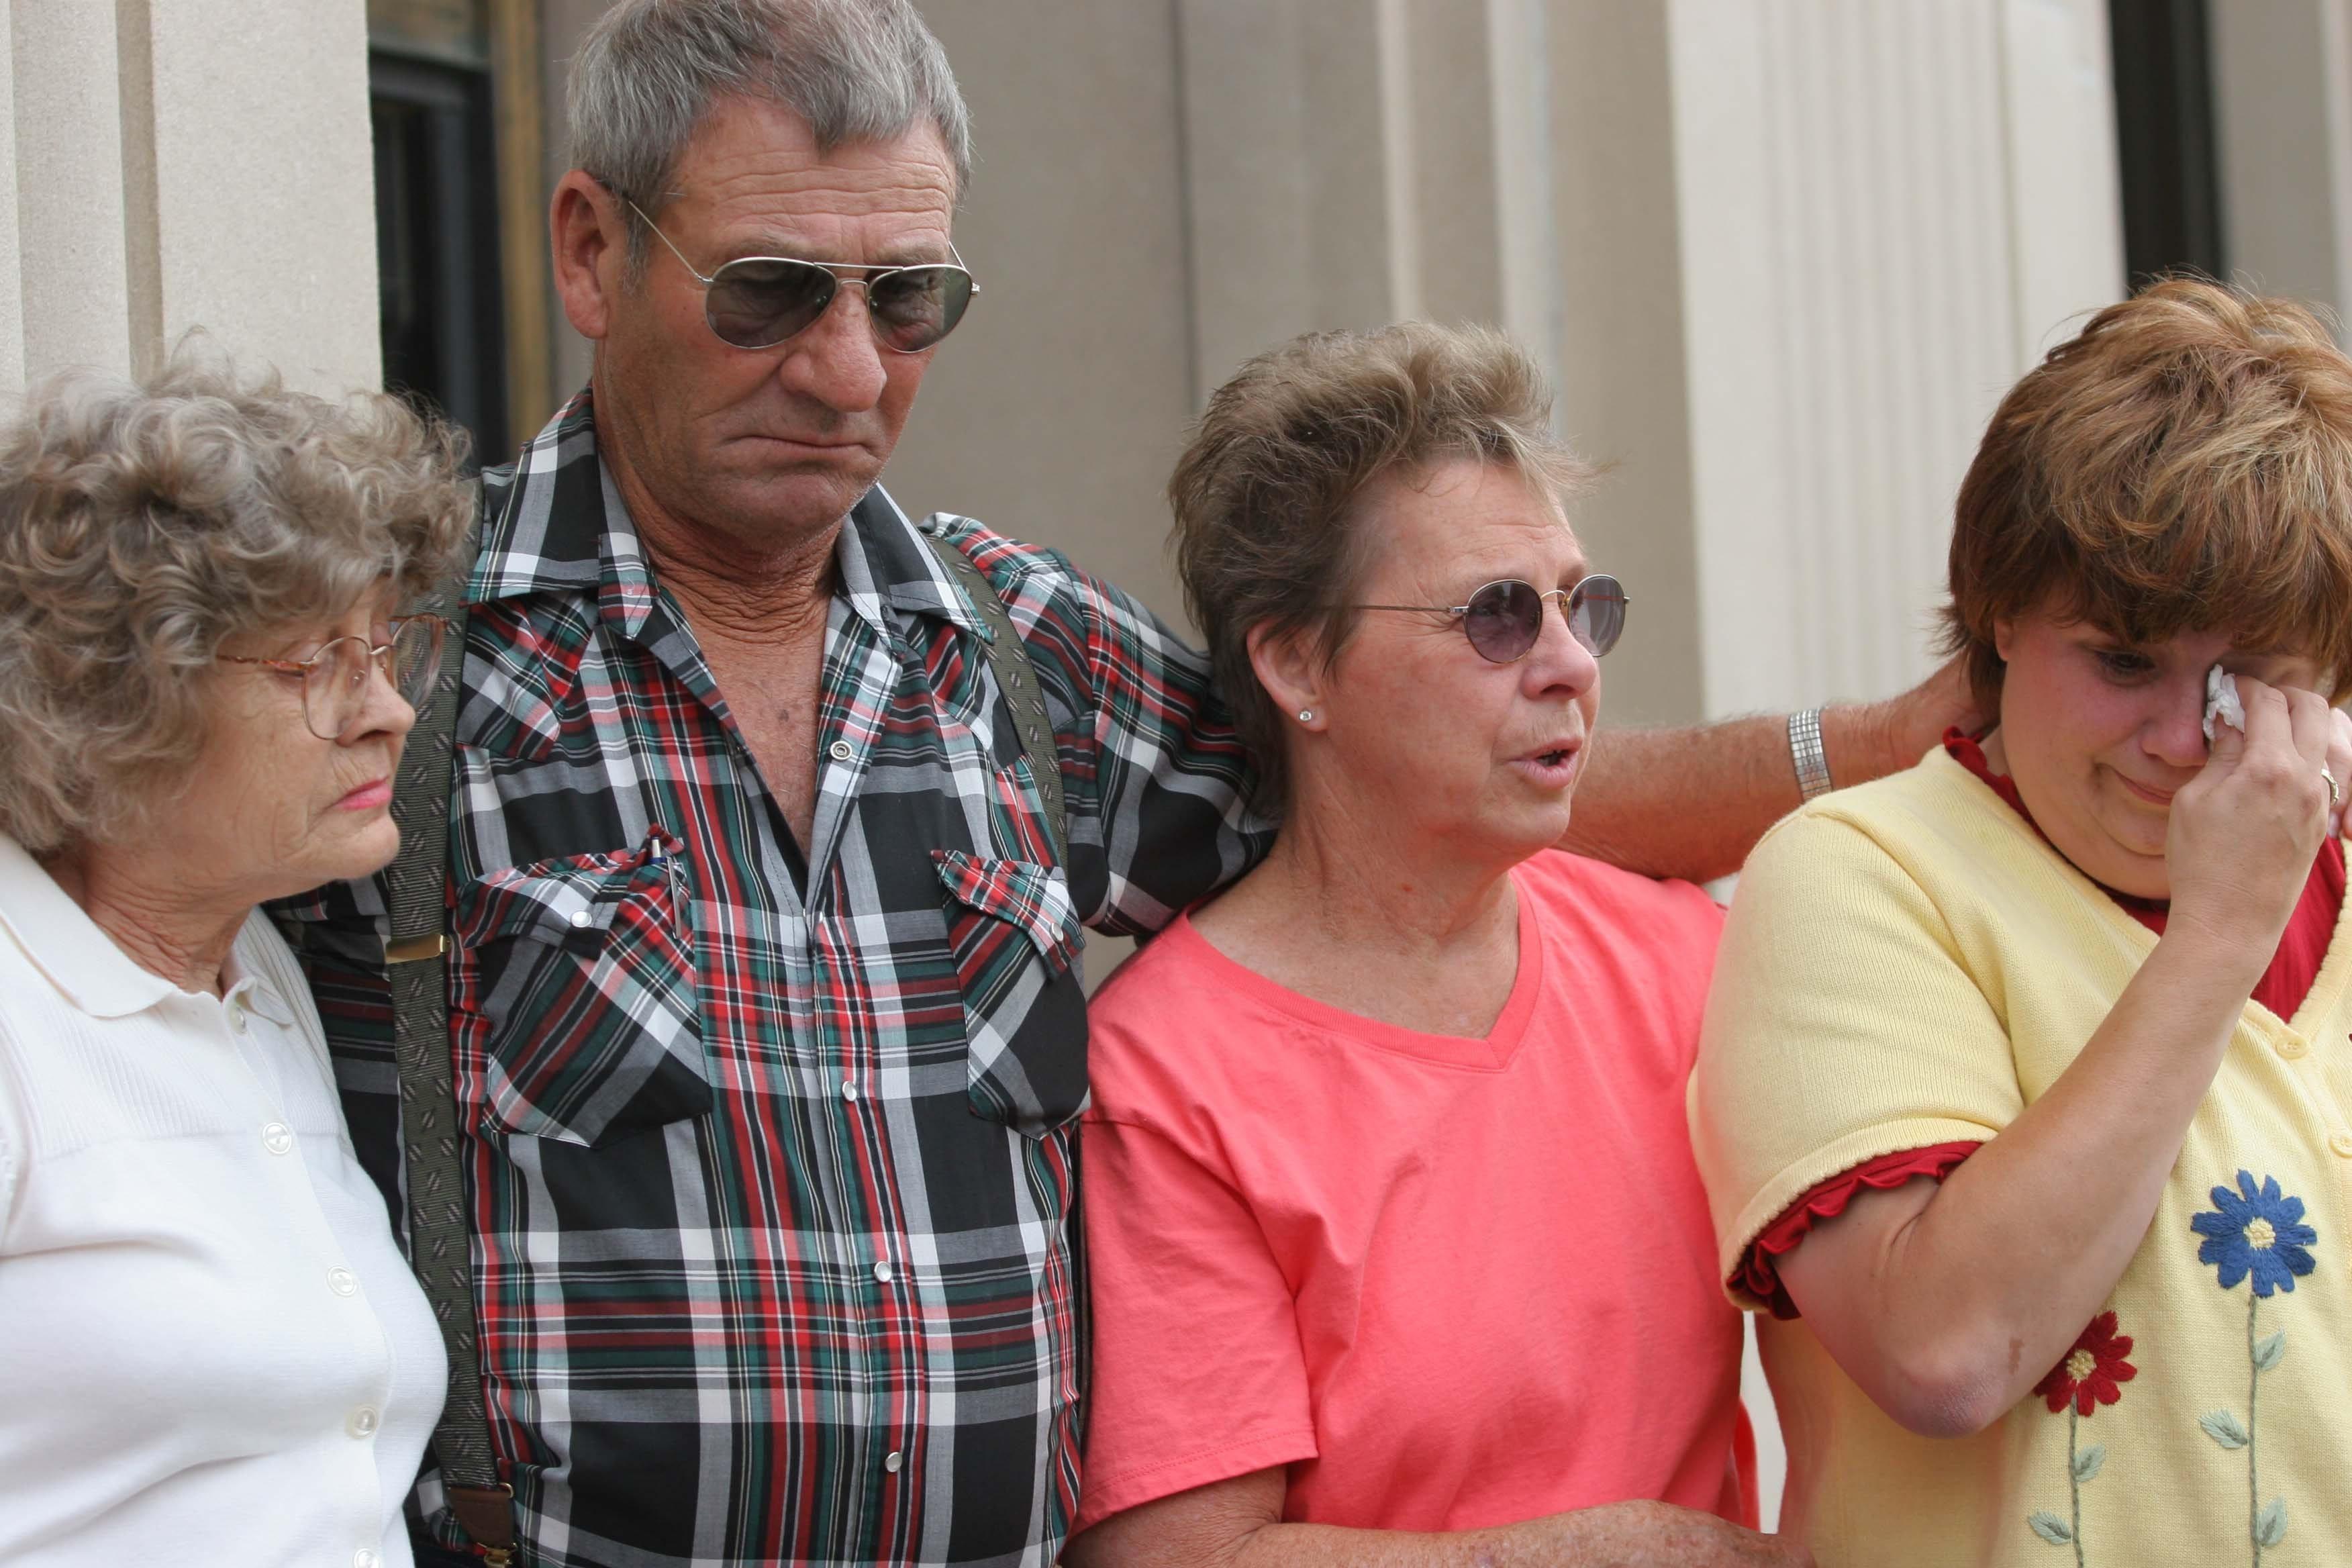 JoAnn DeGeus, Ed DeGeus, Marge Milbrath and Connie Milbrath speak to the media outside the Federal Courthouse in Sioux City, Iowa, Tuesday, June 21, 2005.